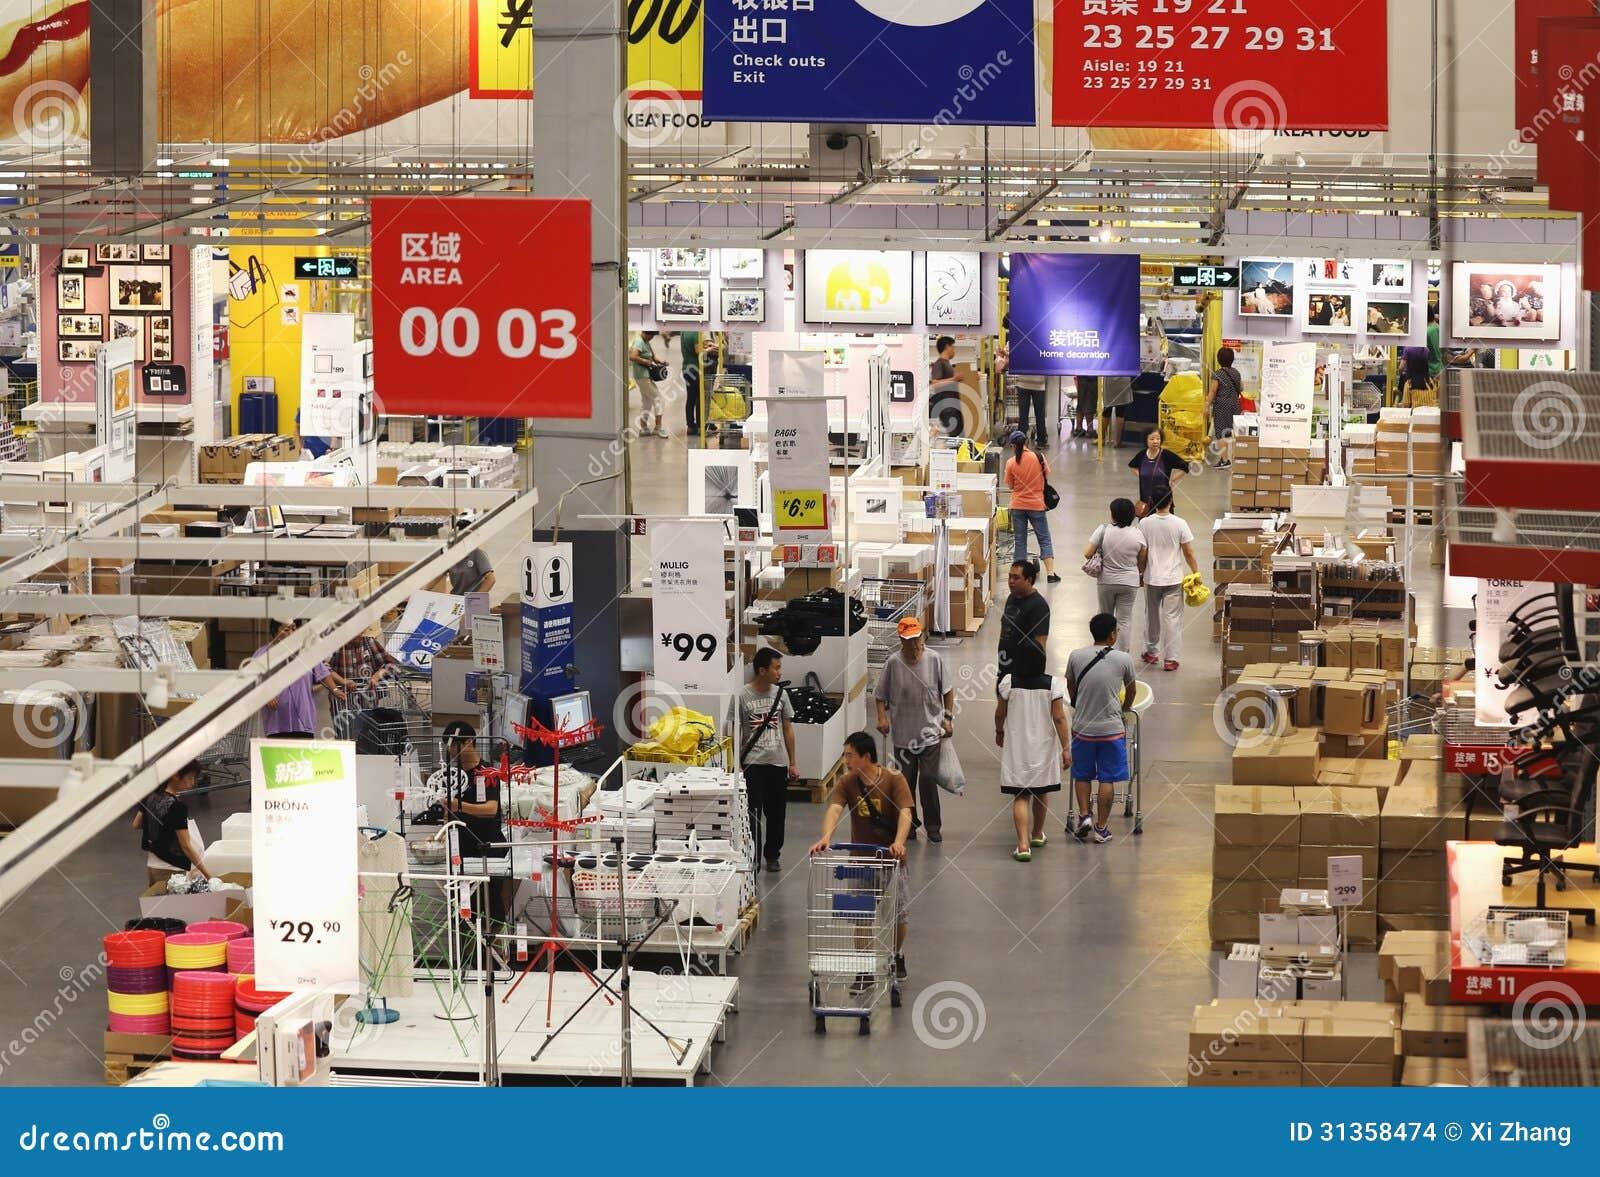 Ikea Warehouse Editorial Stock Image Image Of Shopping 31358474